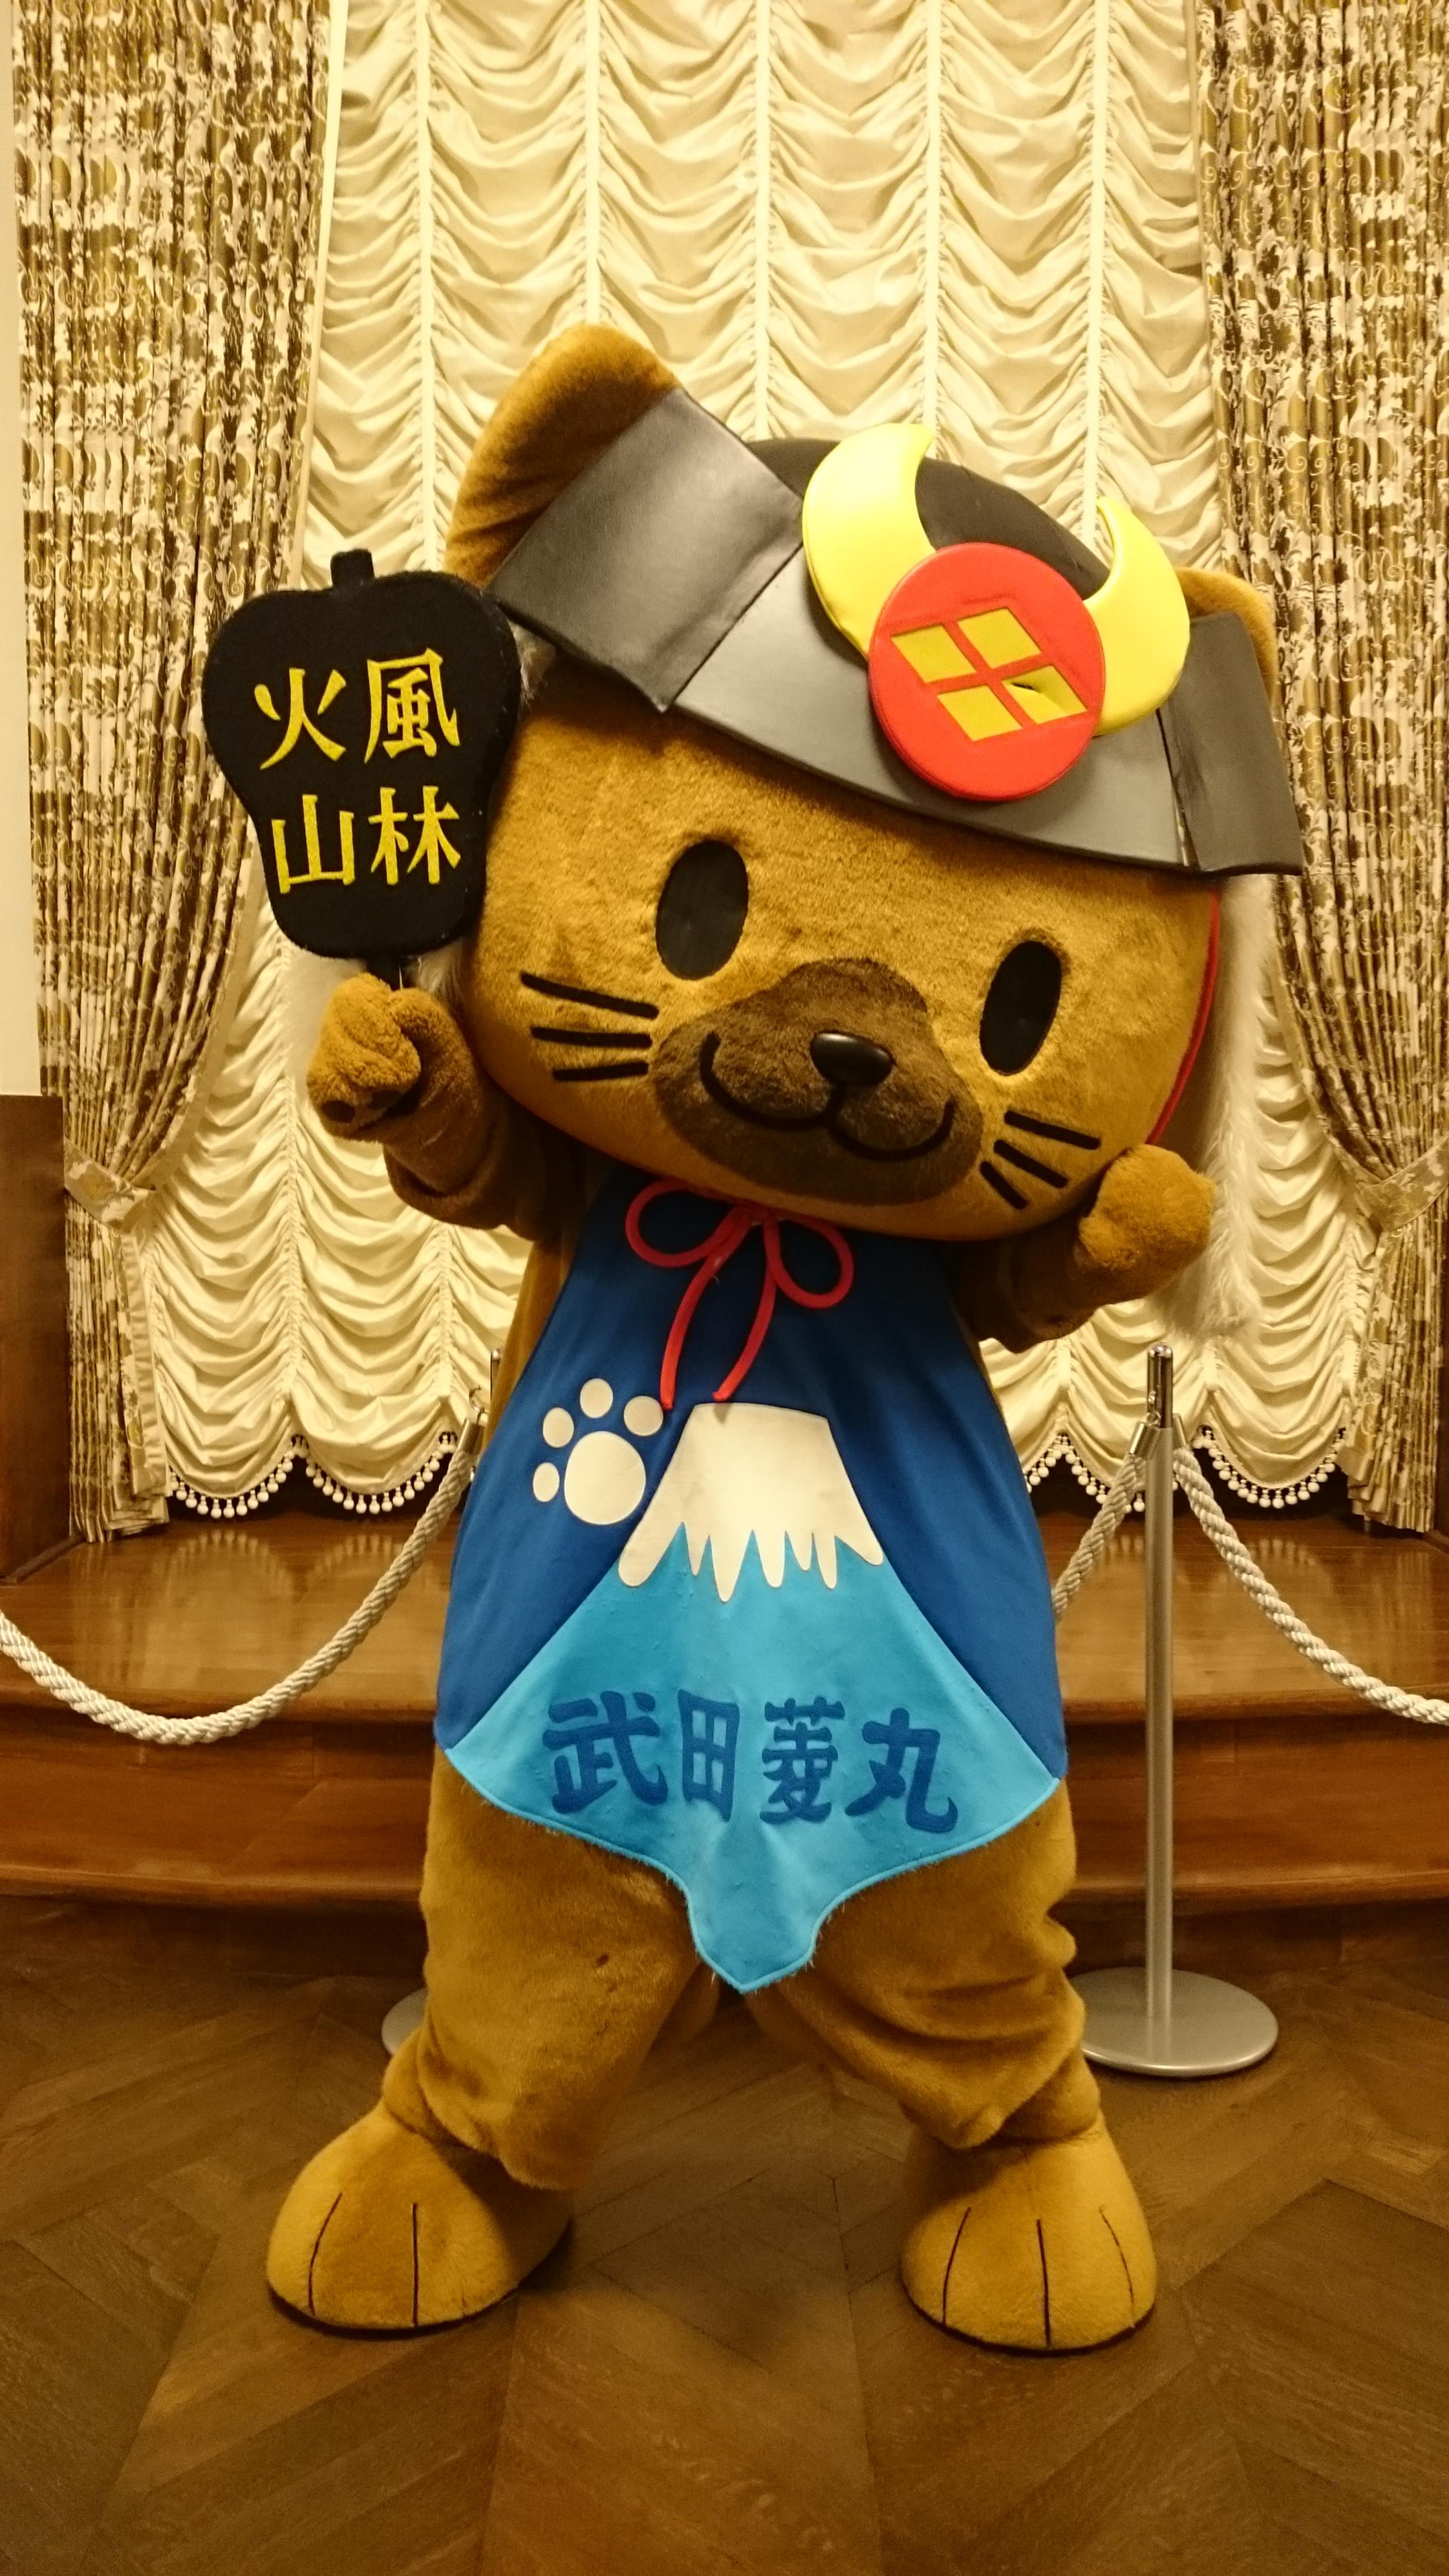 http://www.yamanashi-kankou.jp/blog/%E6%AD%A6%E7%94%B0%E8%8F%B1%E4%B8%B8.JPG